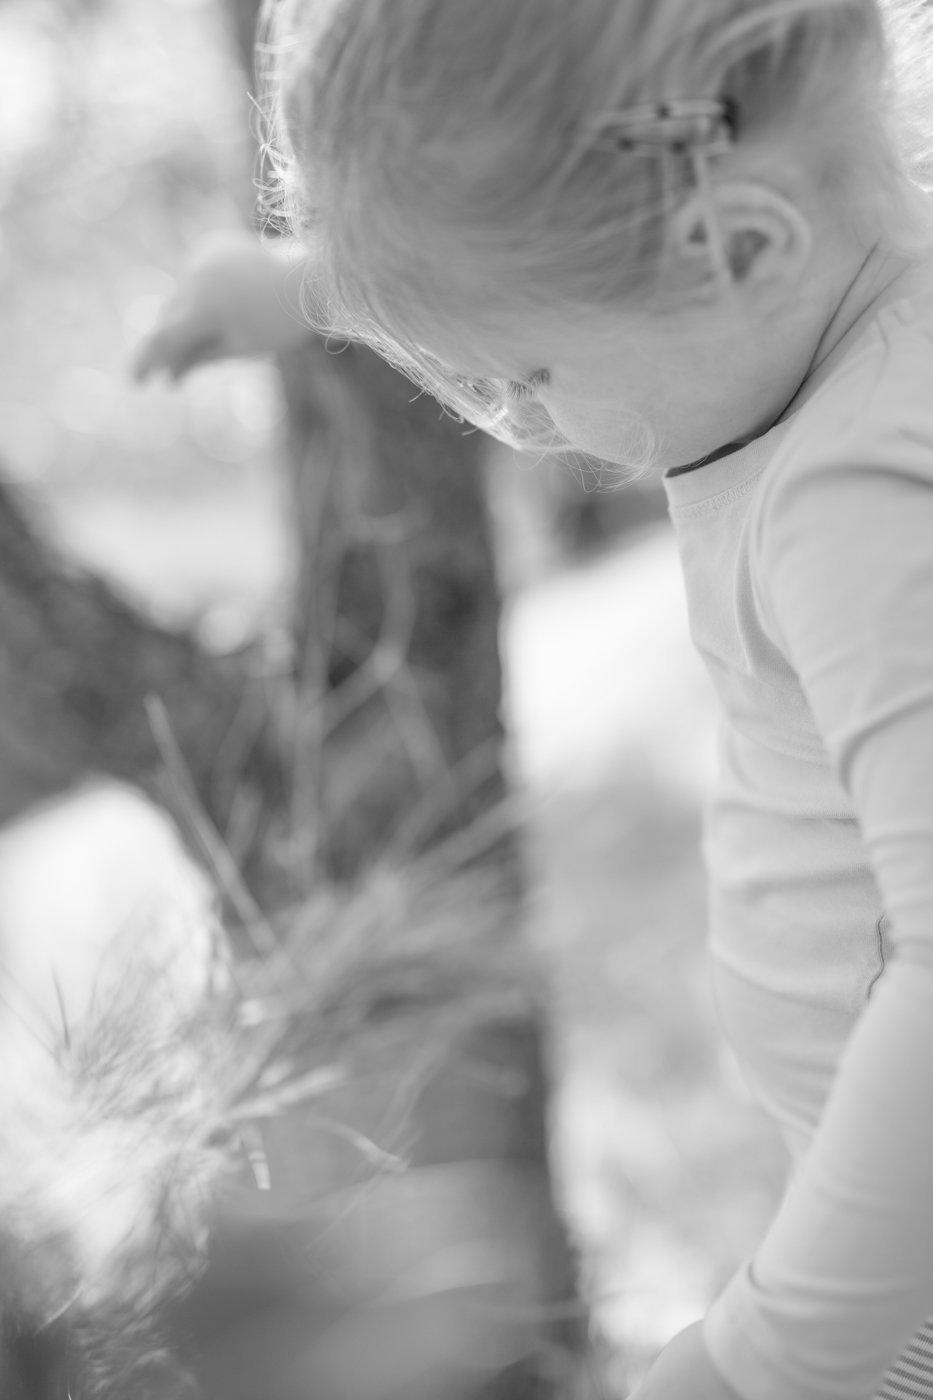 portretfoto jong kind met hooi - © Janneke Walter, kinderfotograaf omgeving Utrecht